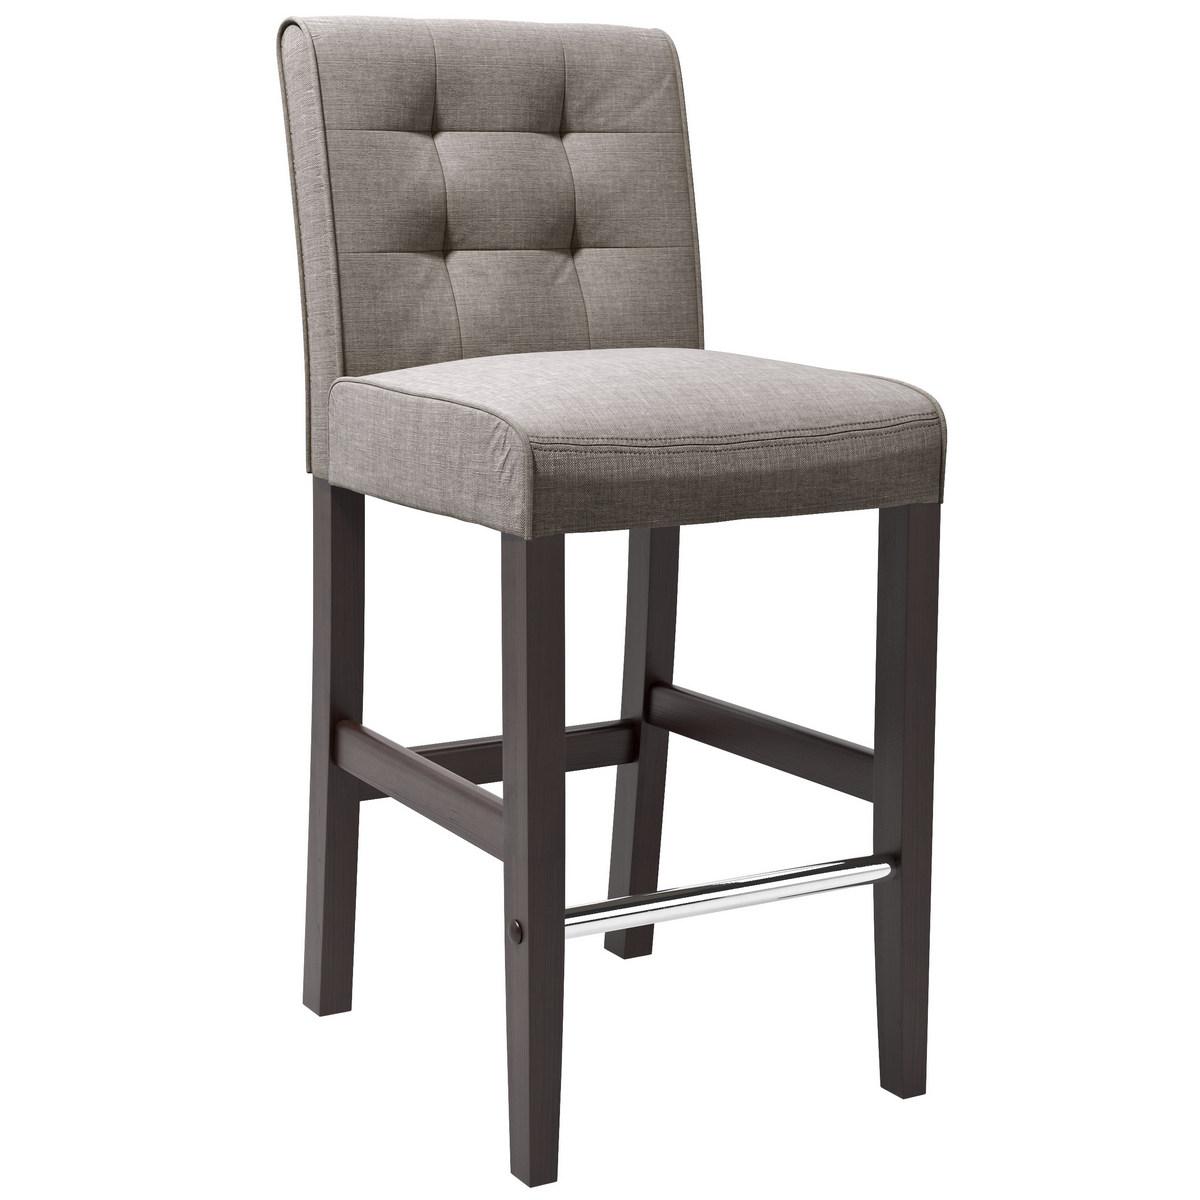 CorLiving DAD-423-B Antonio Bar Height Barstool in Grey Tweed Fabric